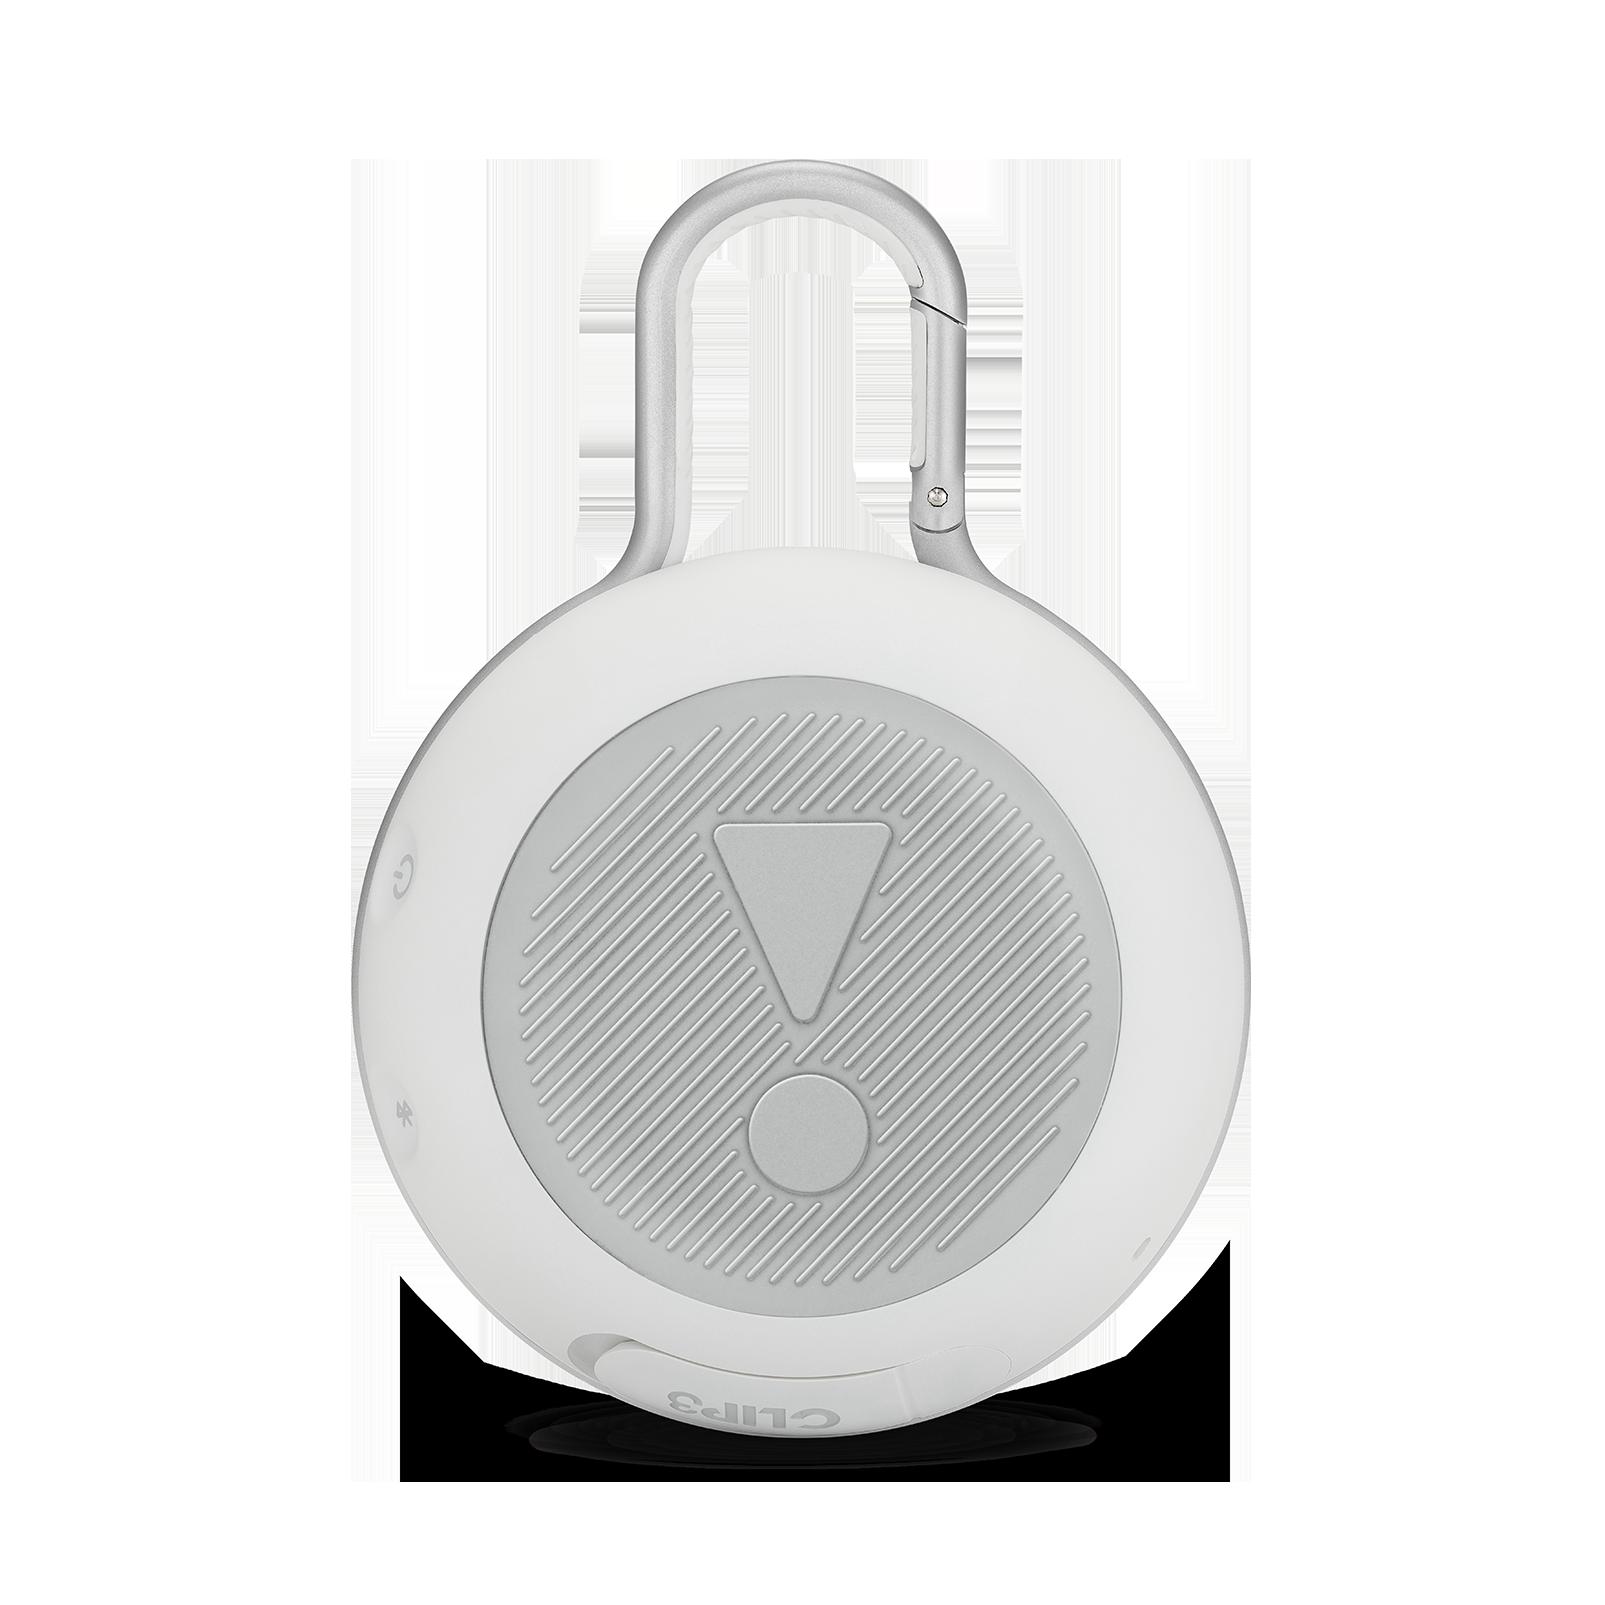 JBL CLIP 3 - Steel White - Portable Bluetooth® speaker - Back